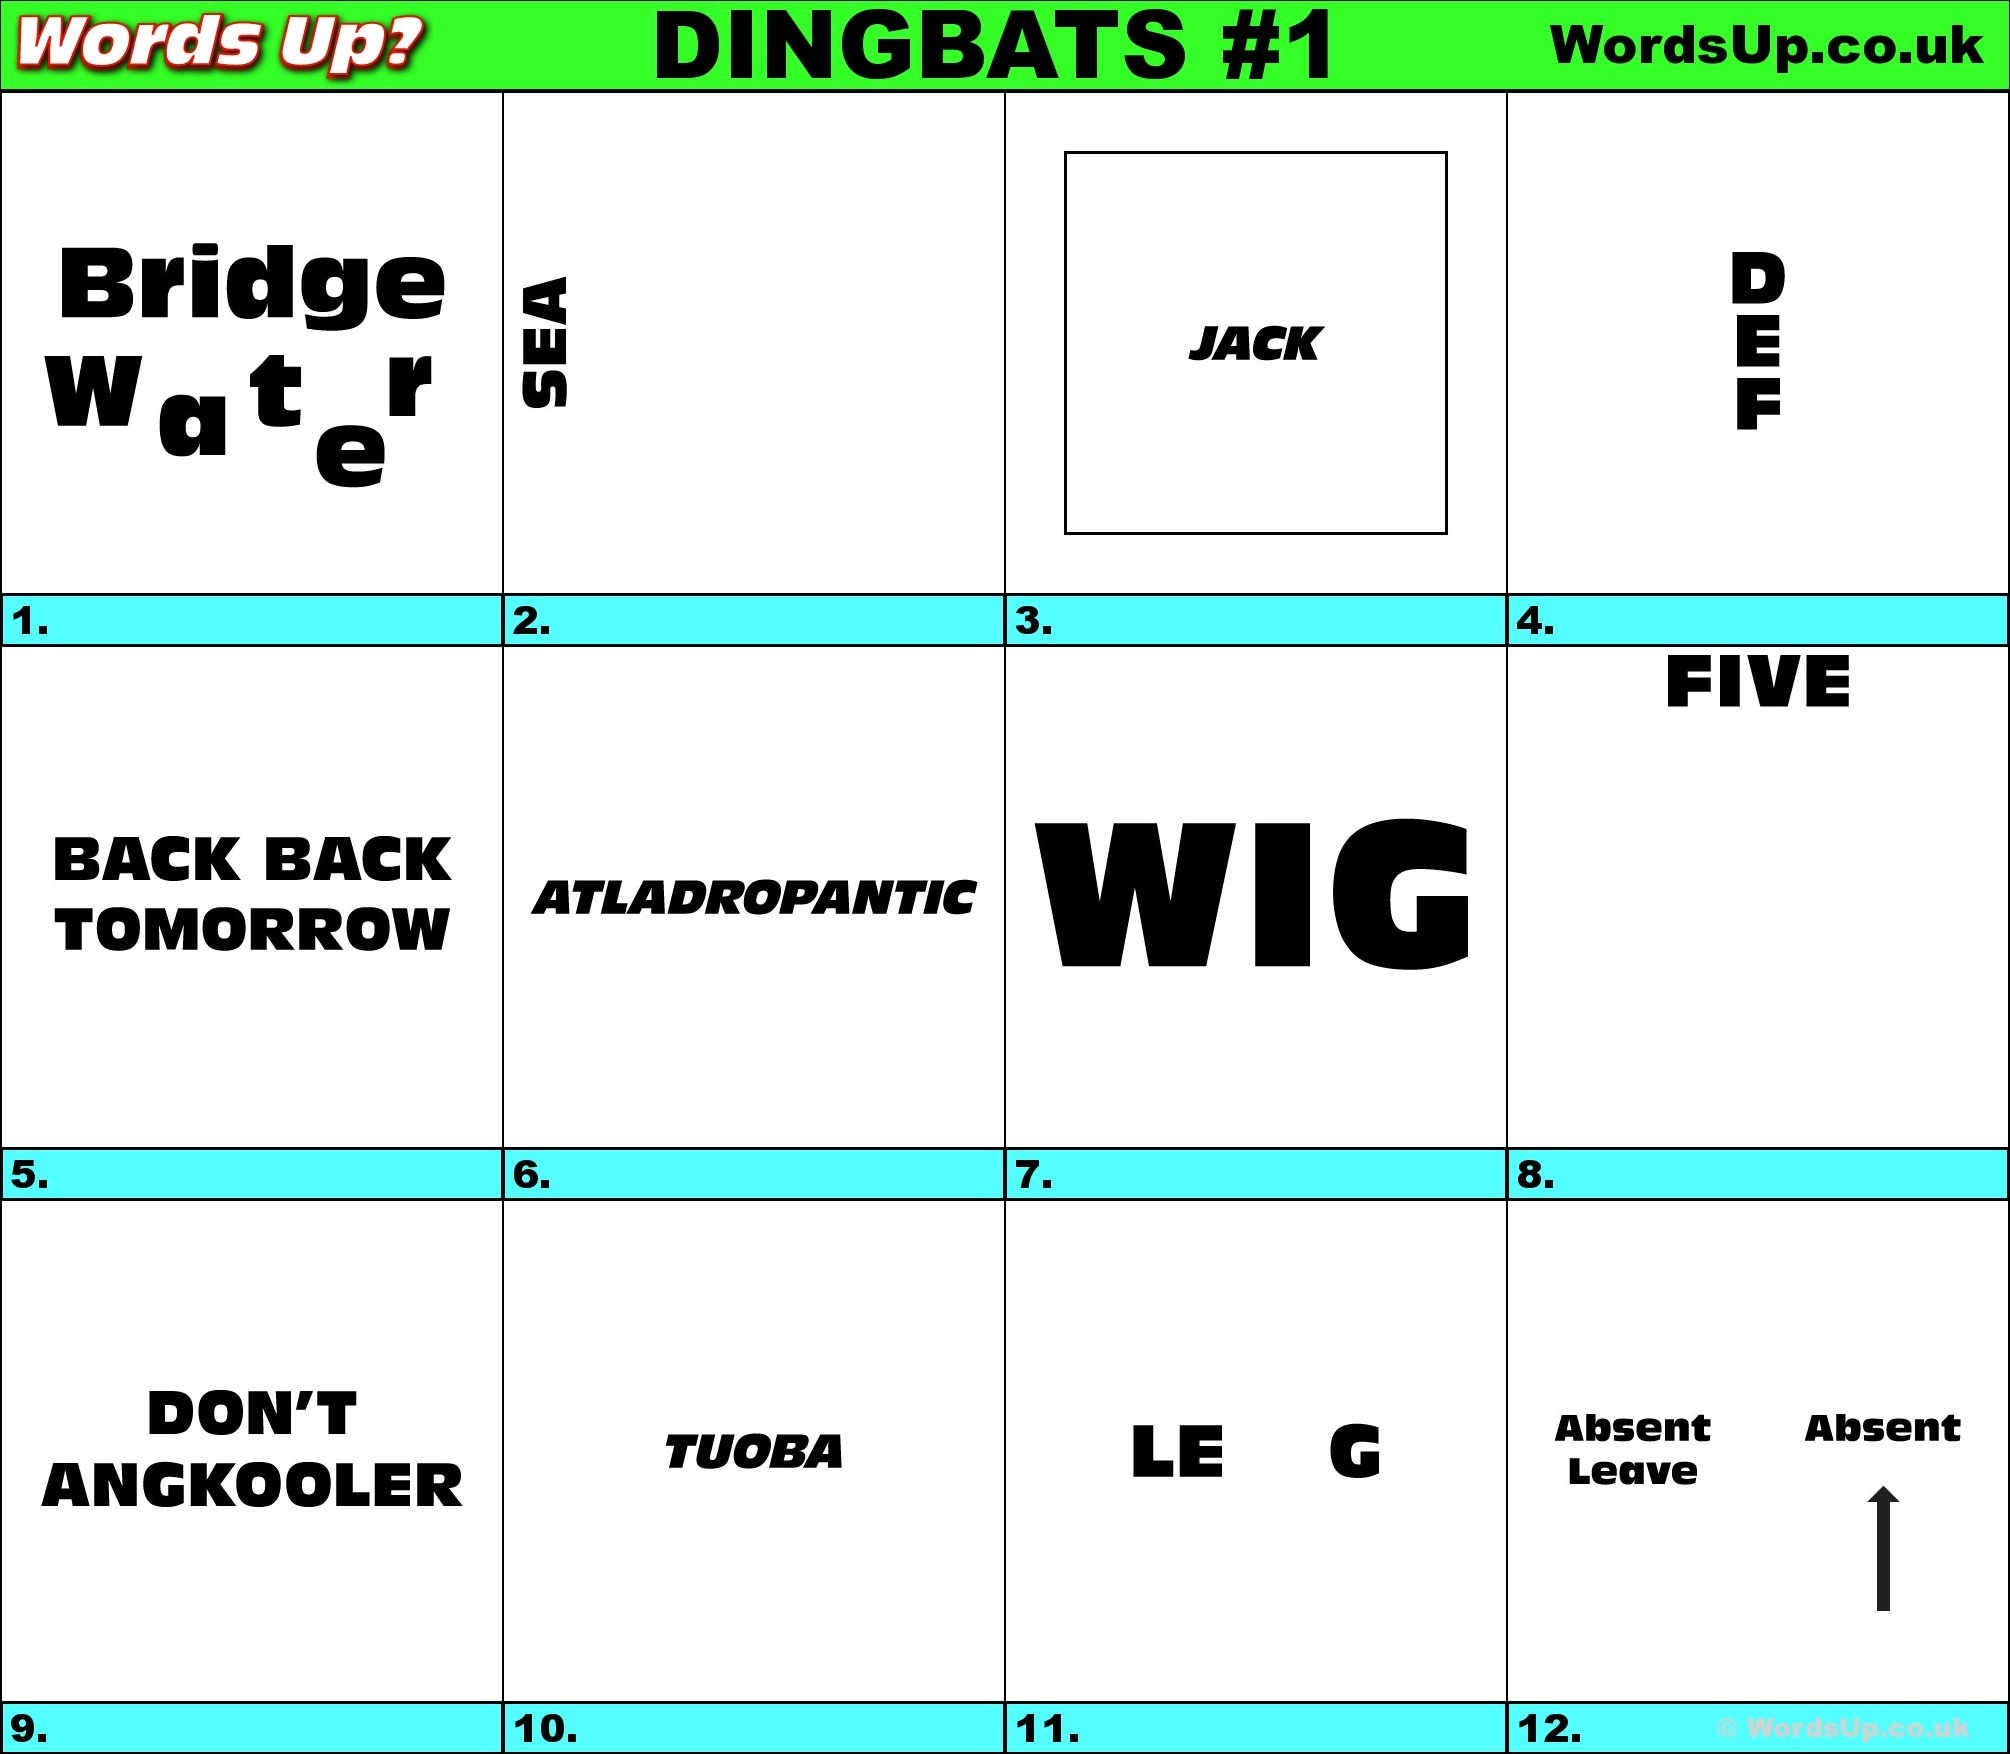 Words Up? Dingbat Puzzles - Free Printable Dingbats Puzzles